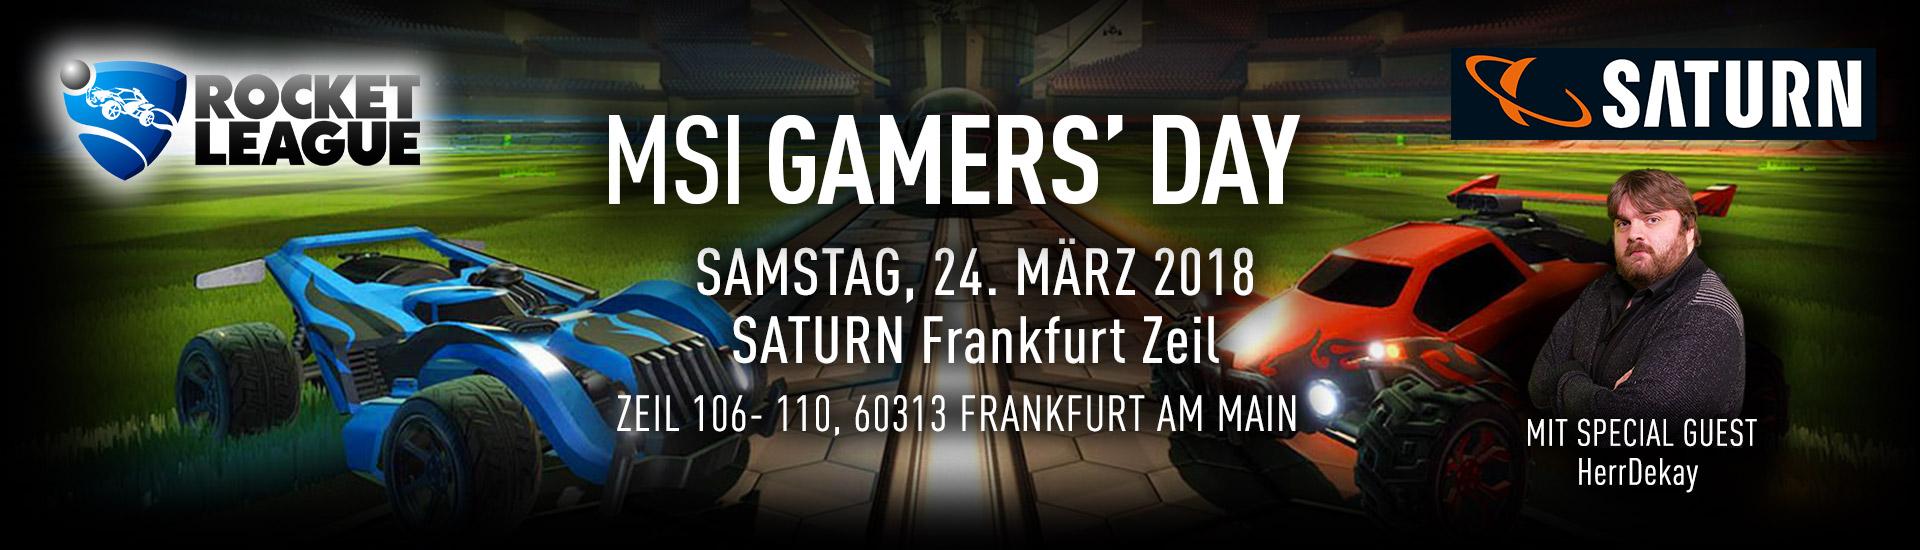 0318 MSI Gamers Day Saturn